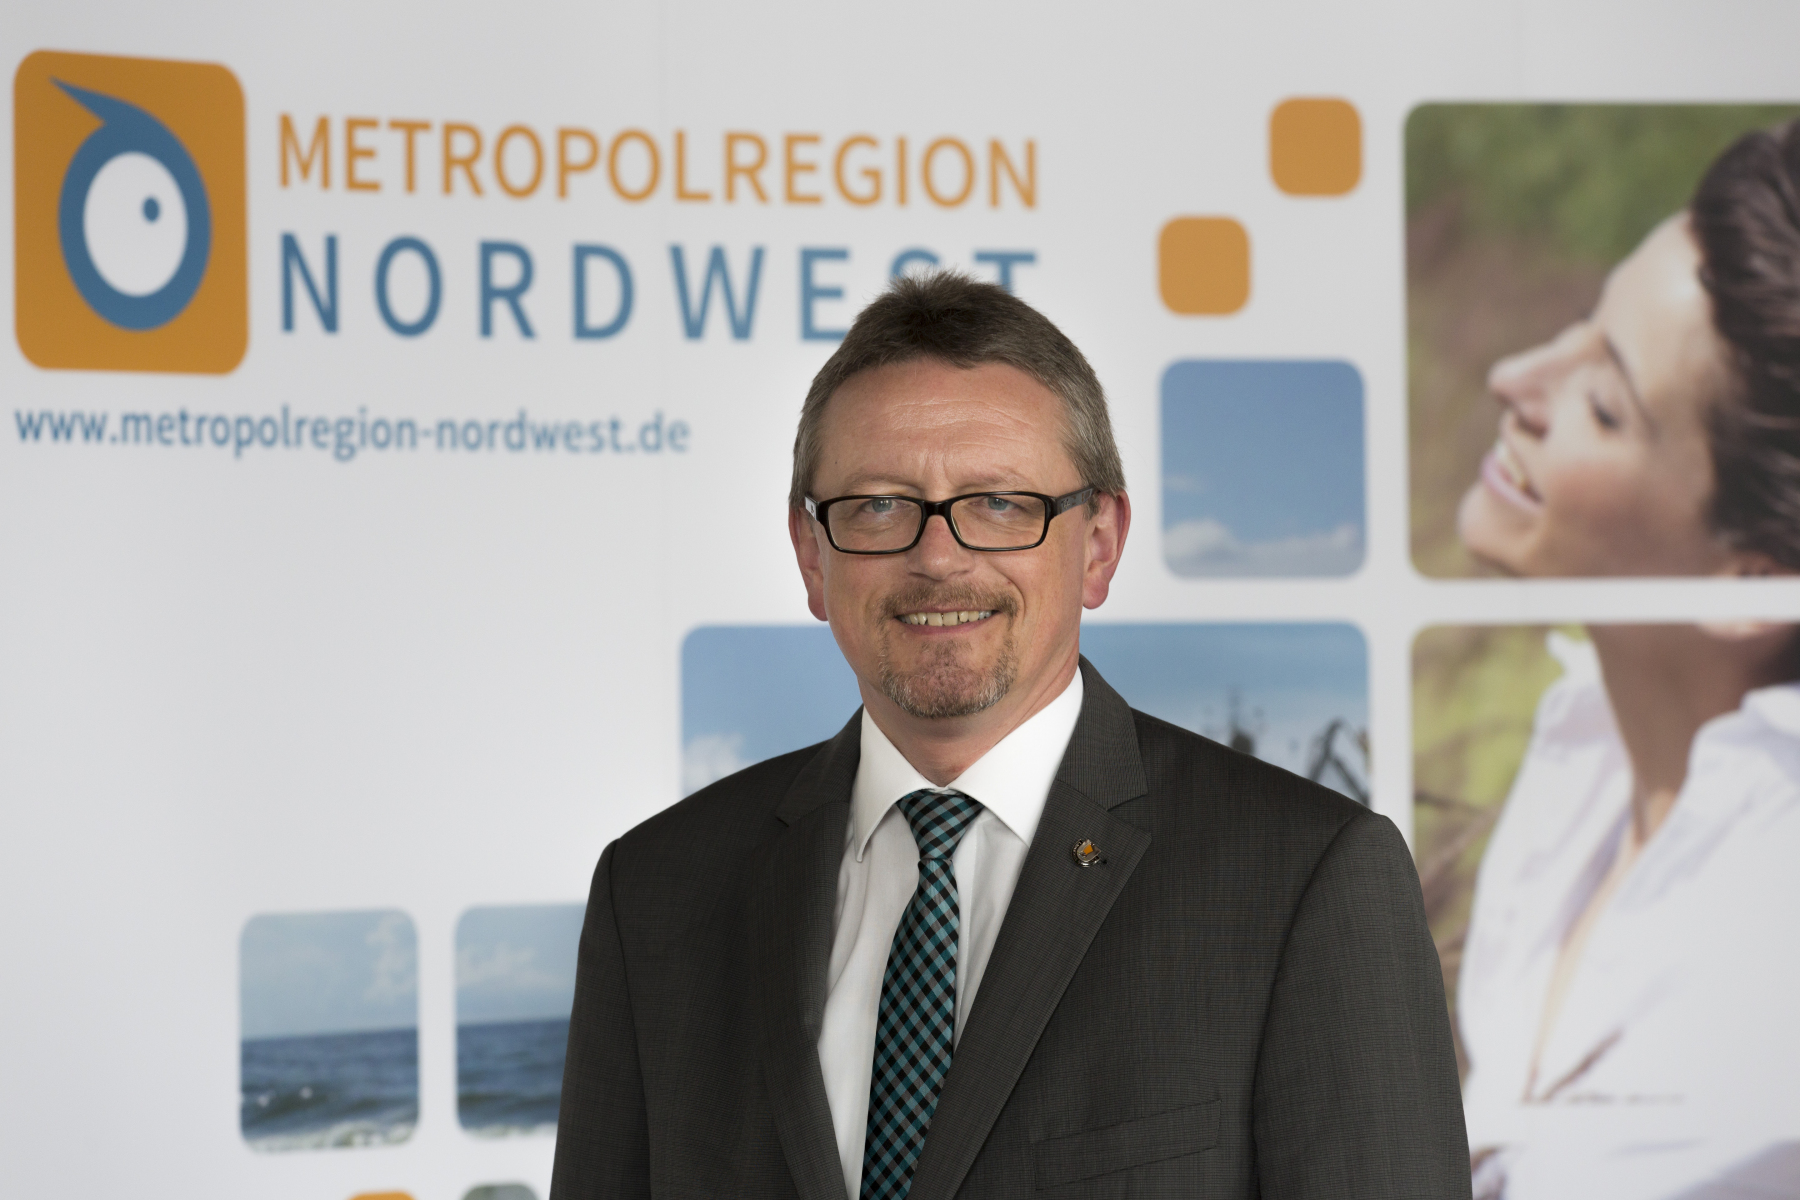 Metropolregion NordWest (2015)